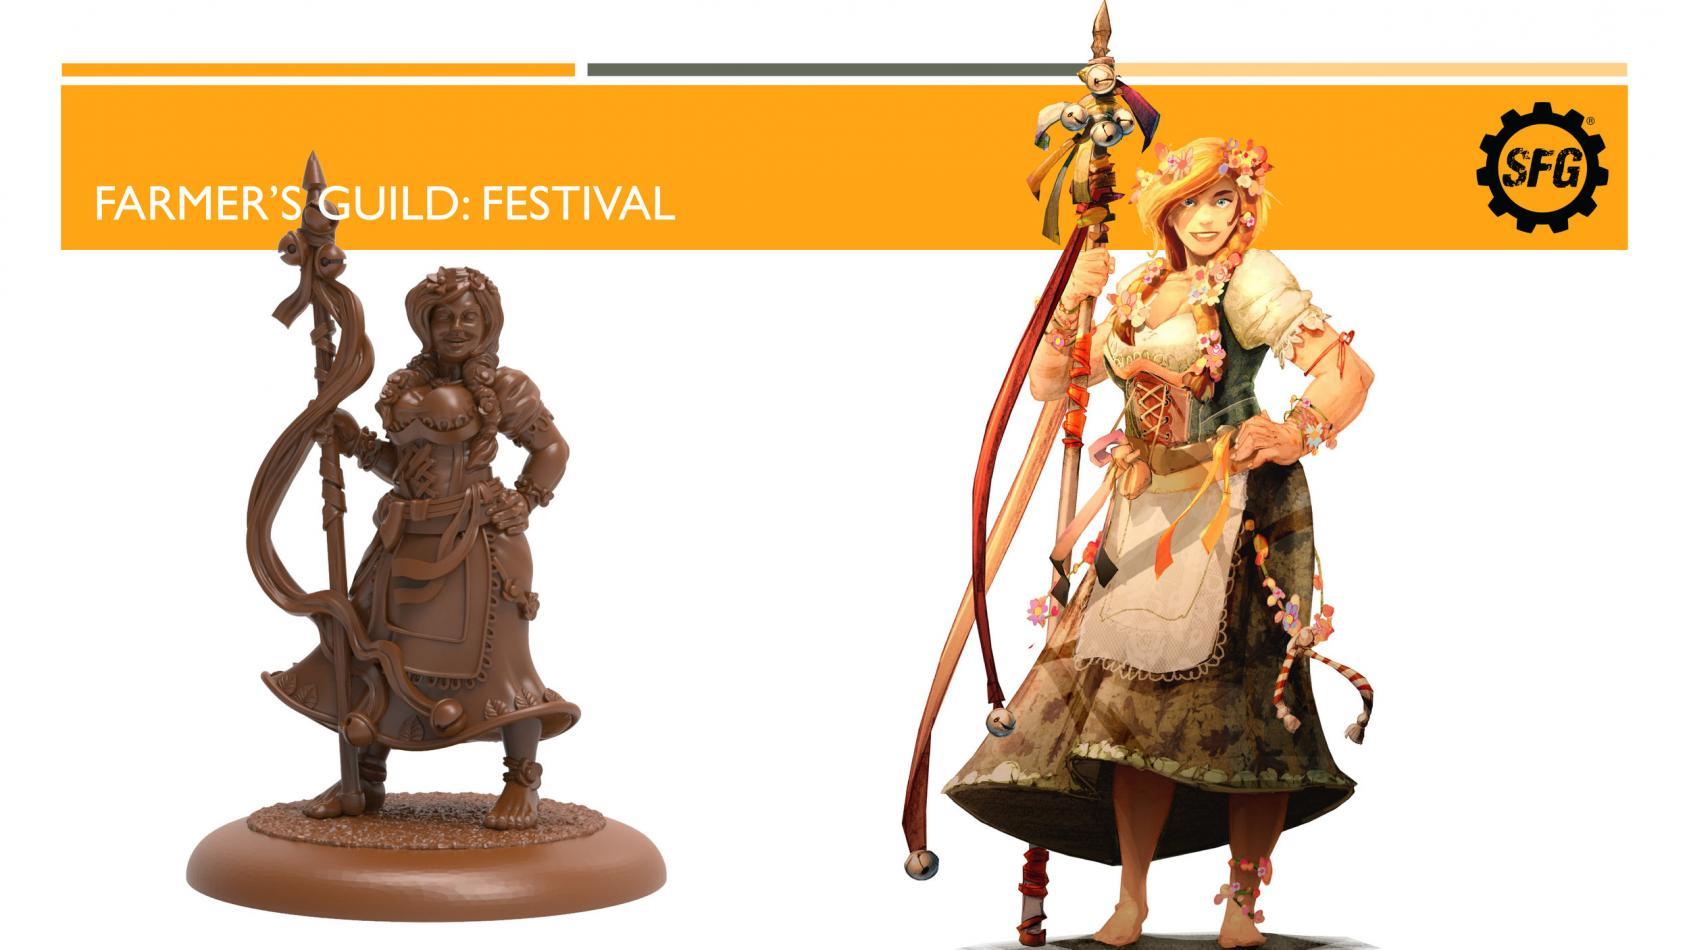 The Farmer's Guild: Festival